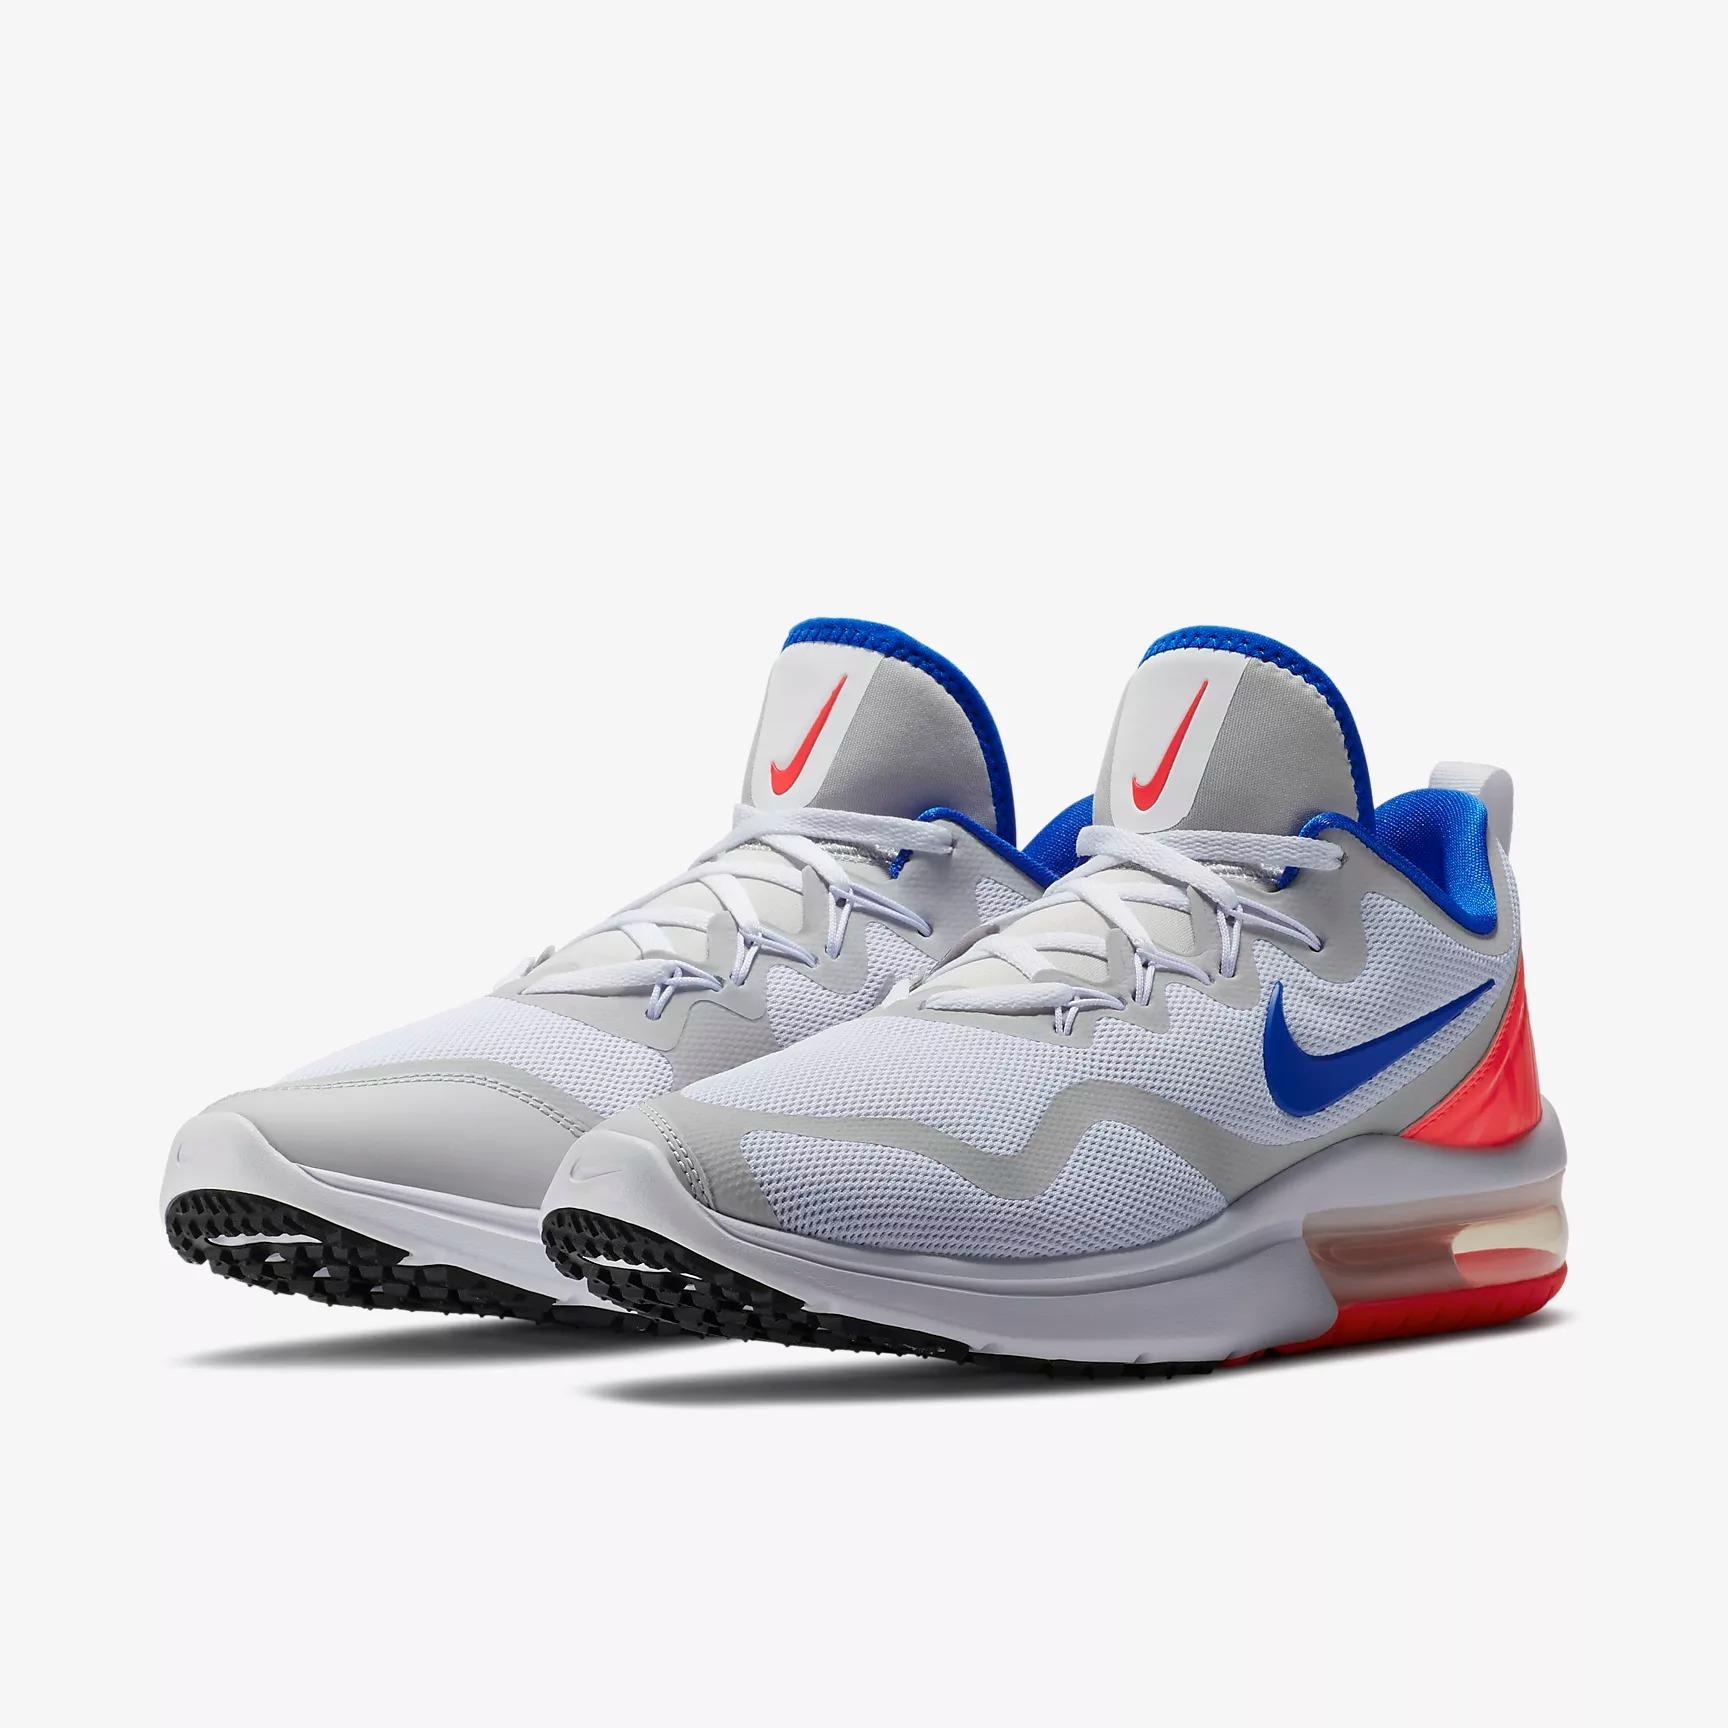 92b63e24bec6d Nike Air Max Fury Running Shoes - SPORT SHOES RUNNING SHOES - Superfanas.lt